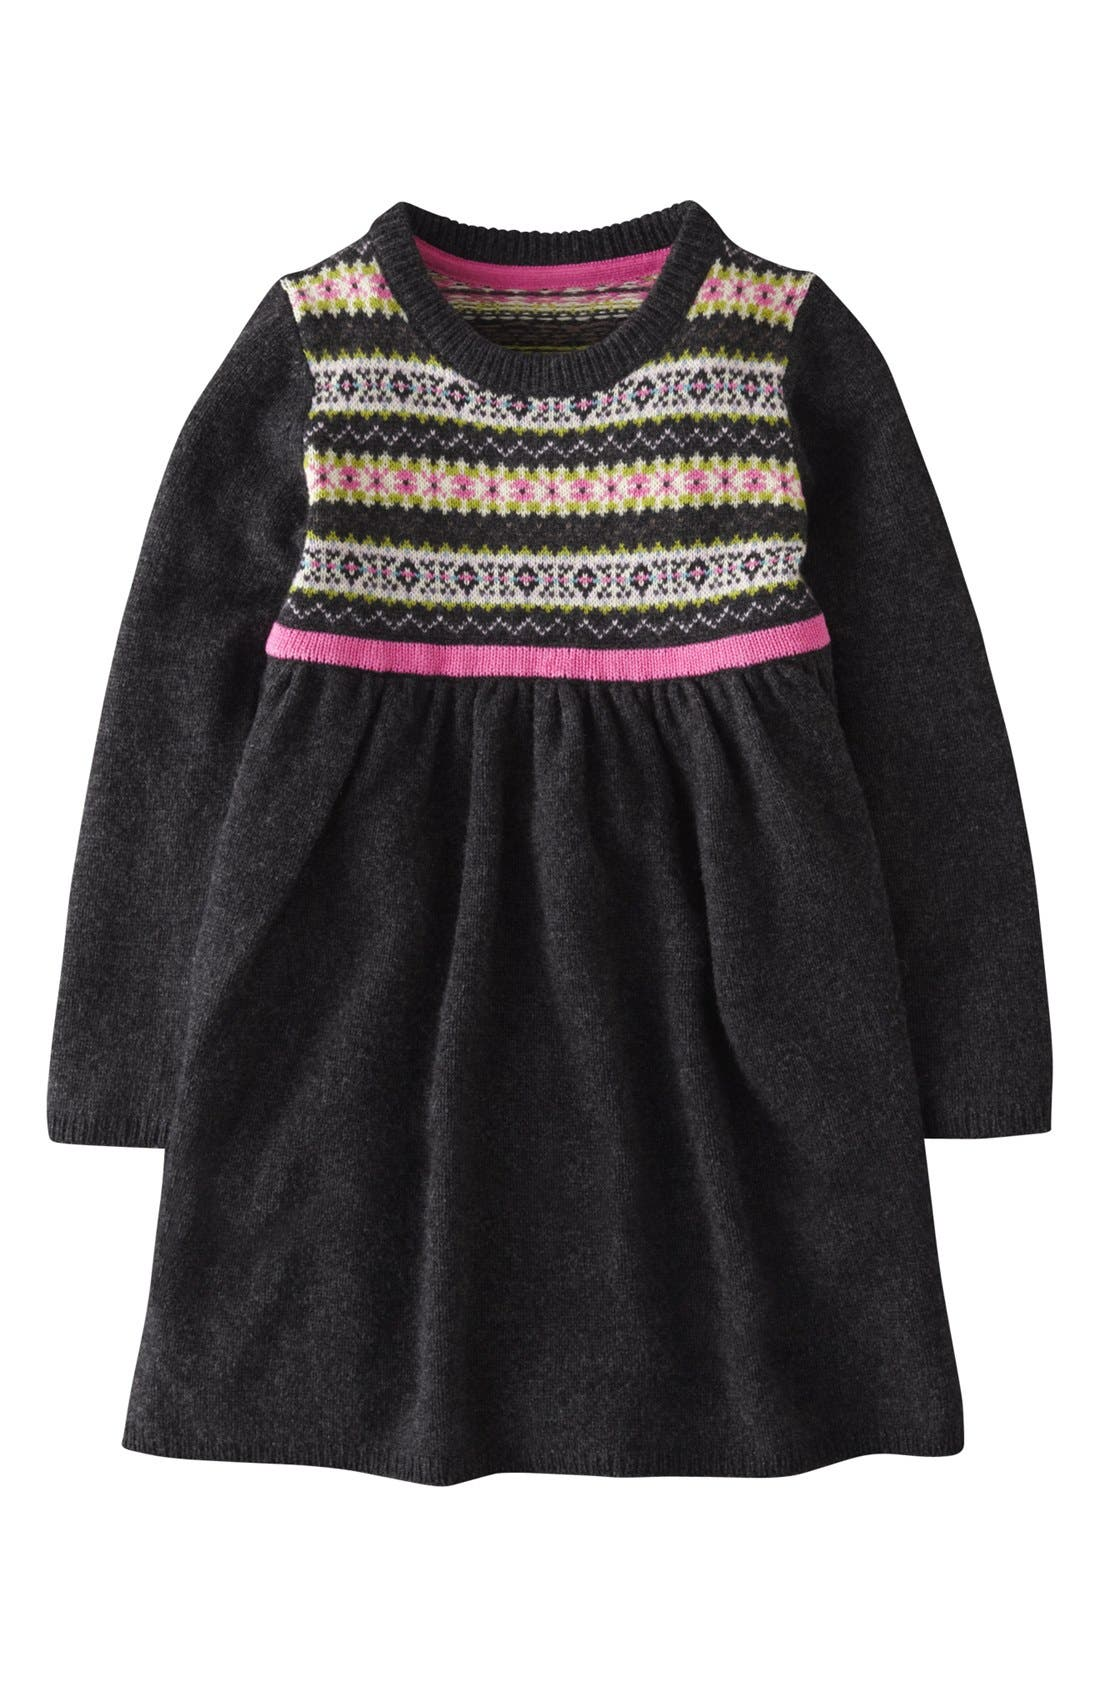 Main Image - Mini Boden Fair Isle Knit Dress (Toddler Girls)